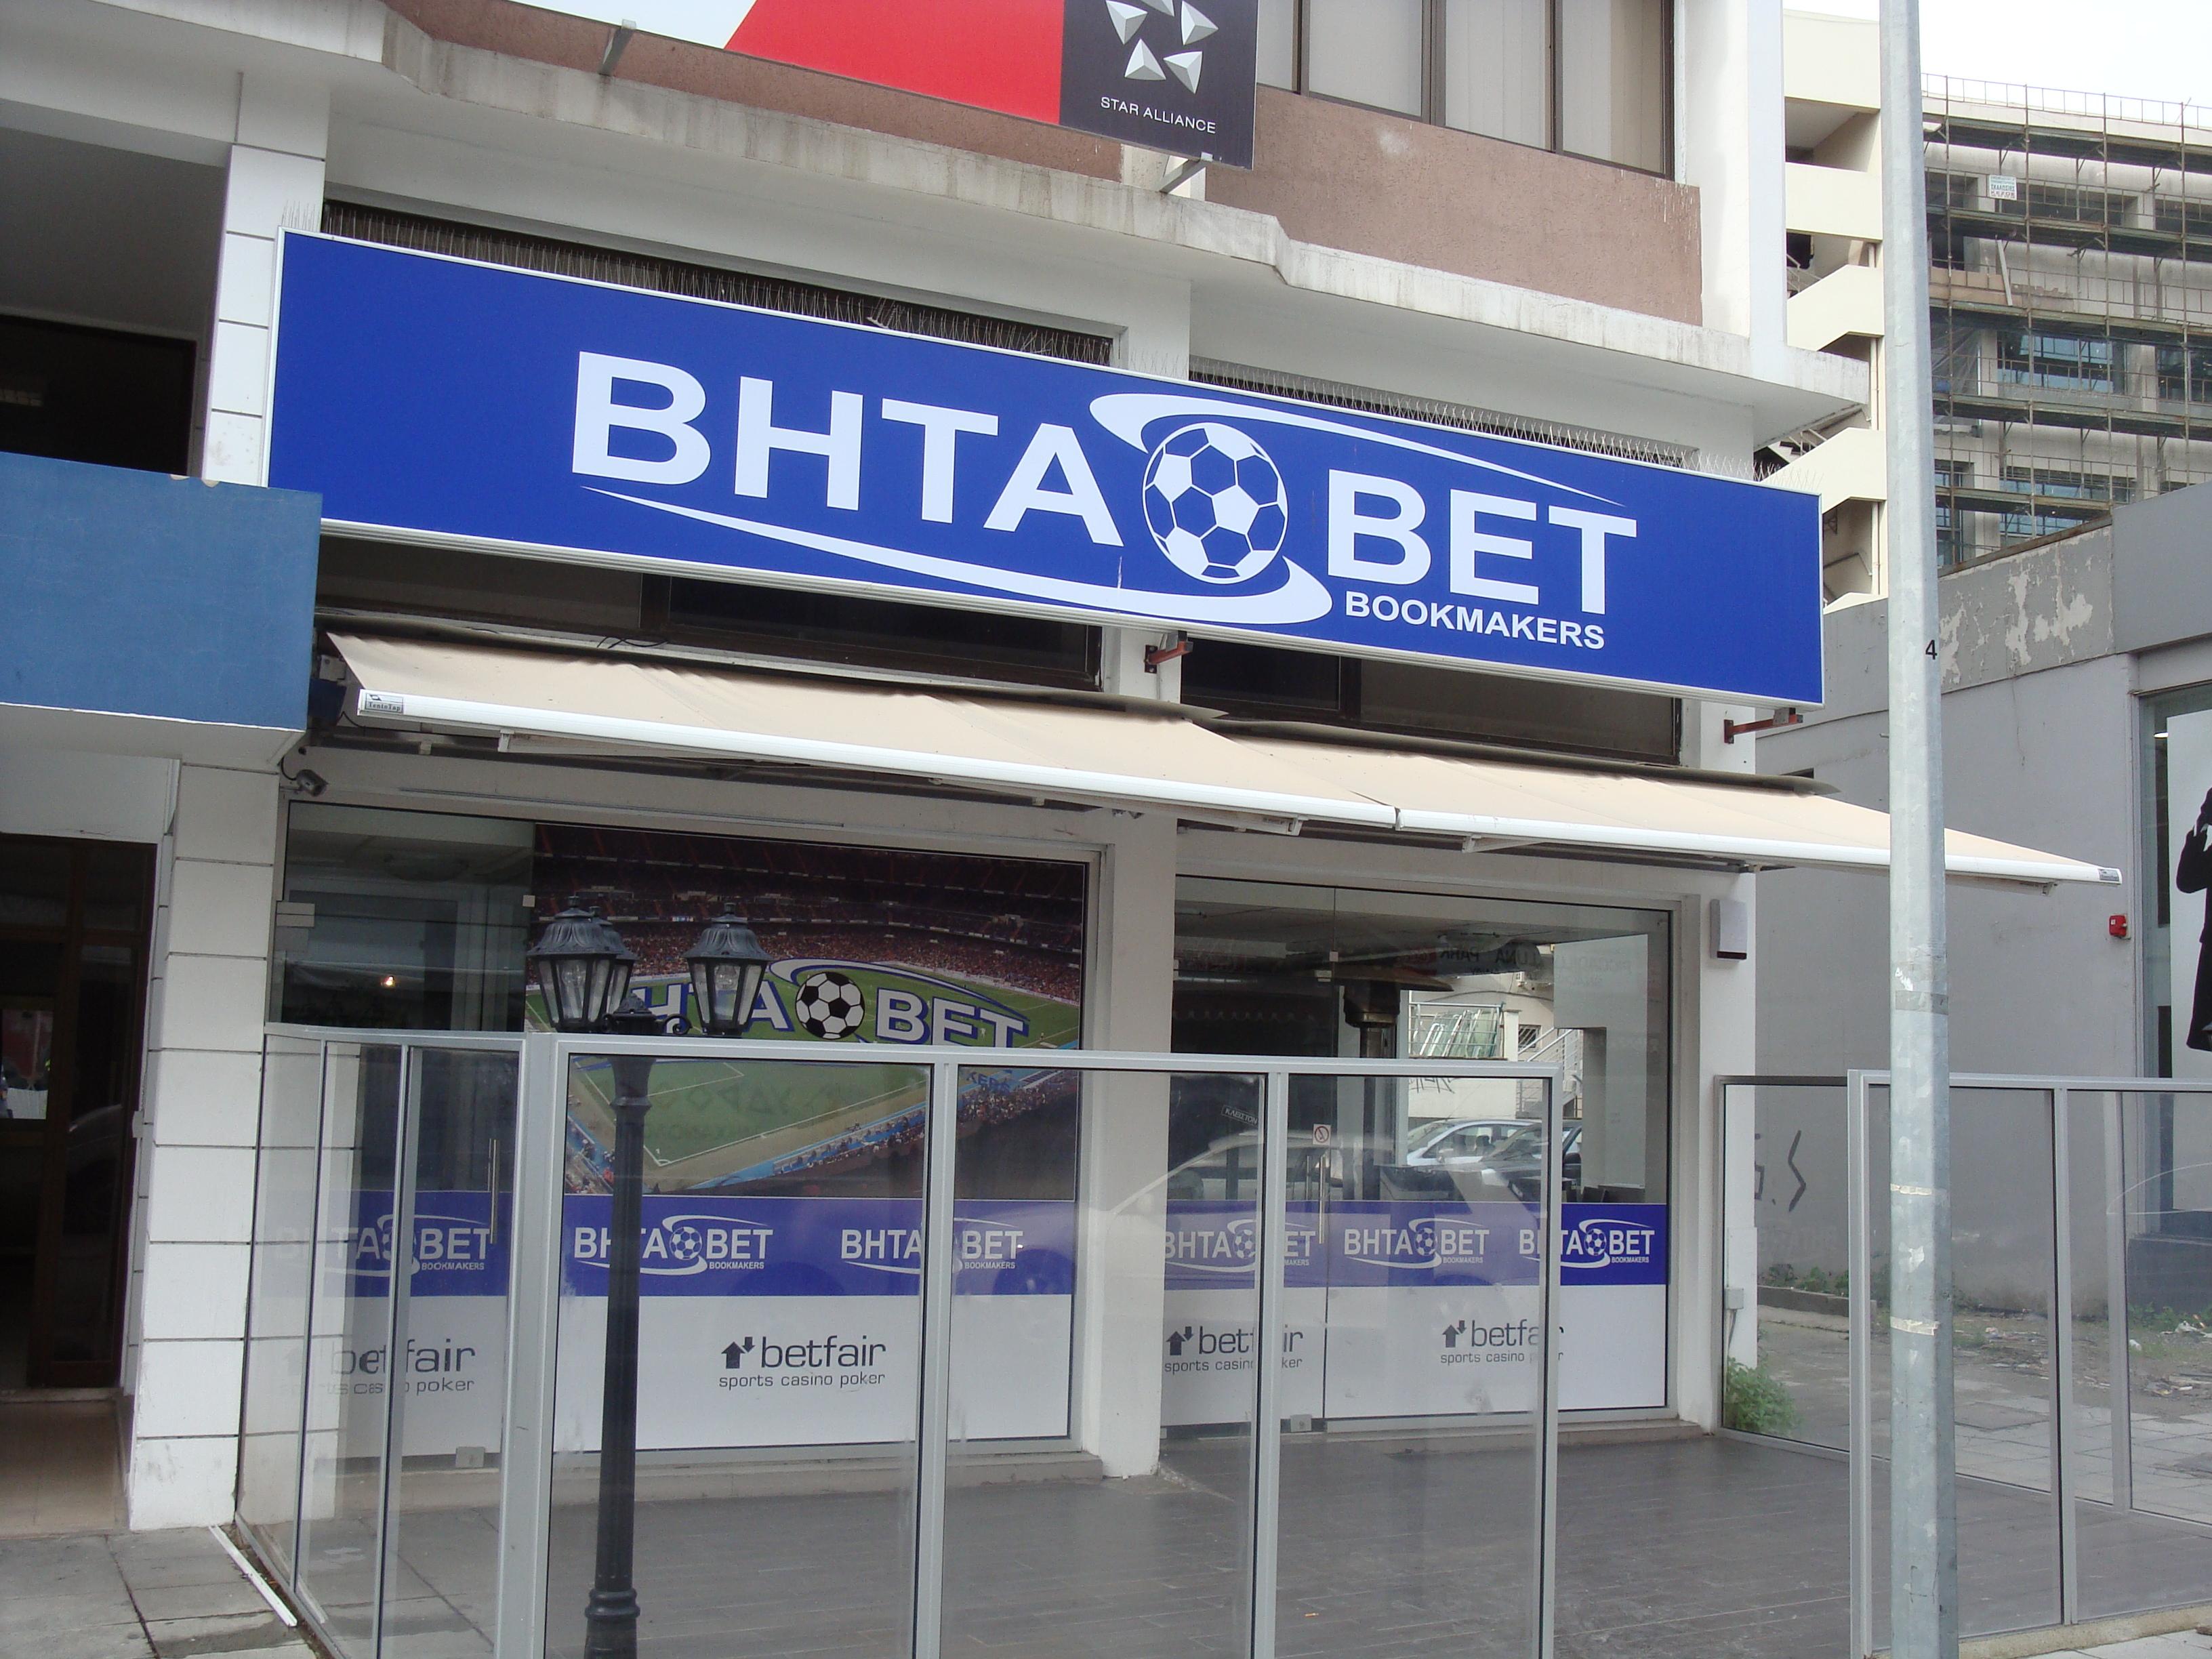 Bhtabet nicosia betting 3 betting light tournamentasa